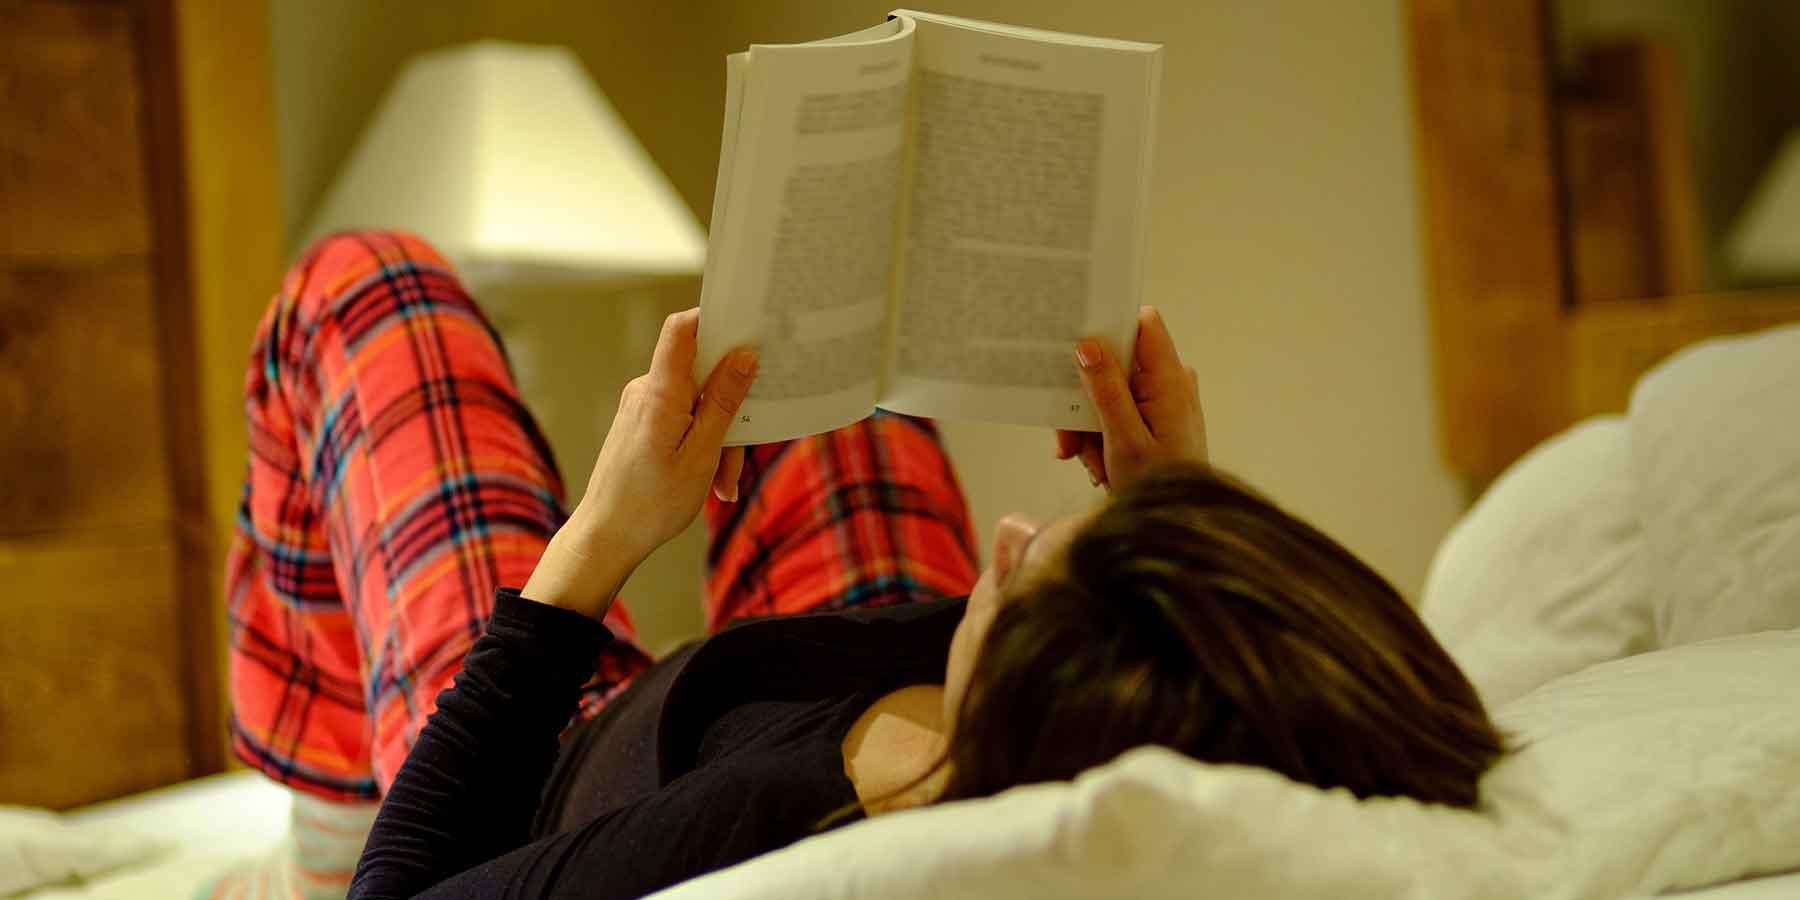 Reading books at night before sleeping